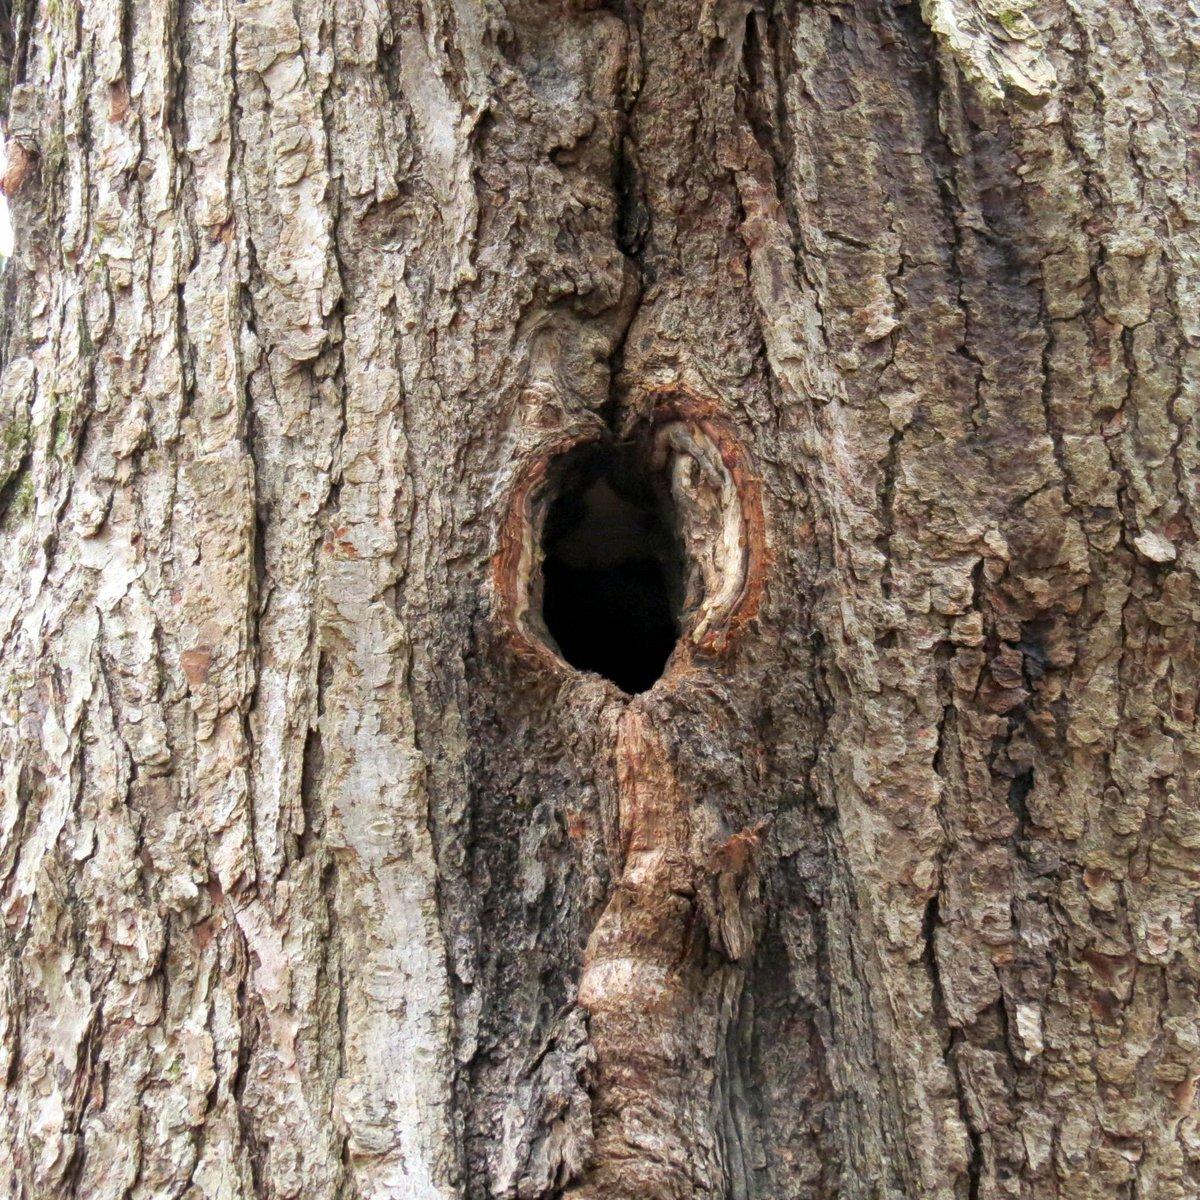 21-woodpecker-hole